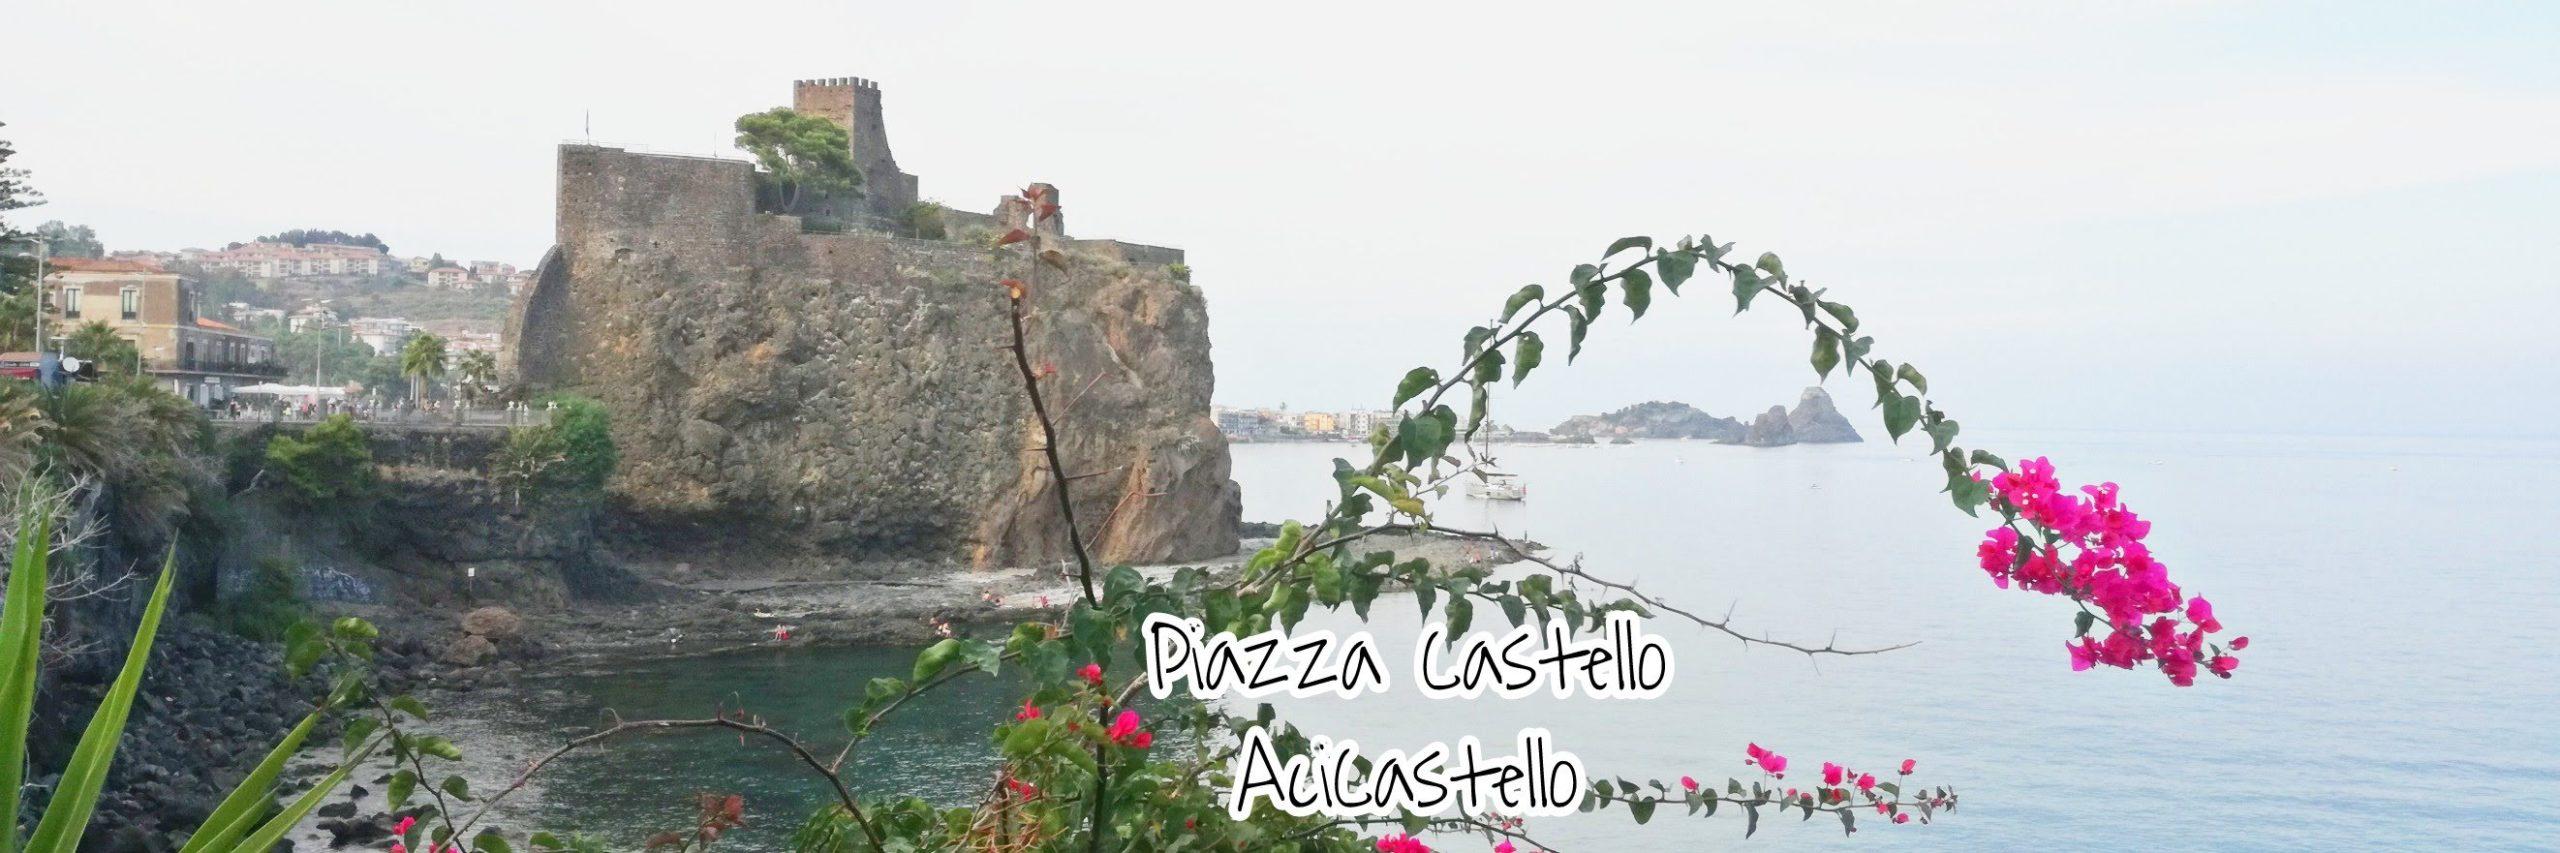 Dove portare bambini a Catania